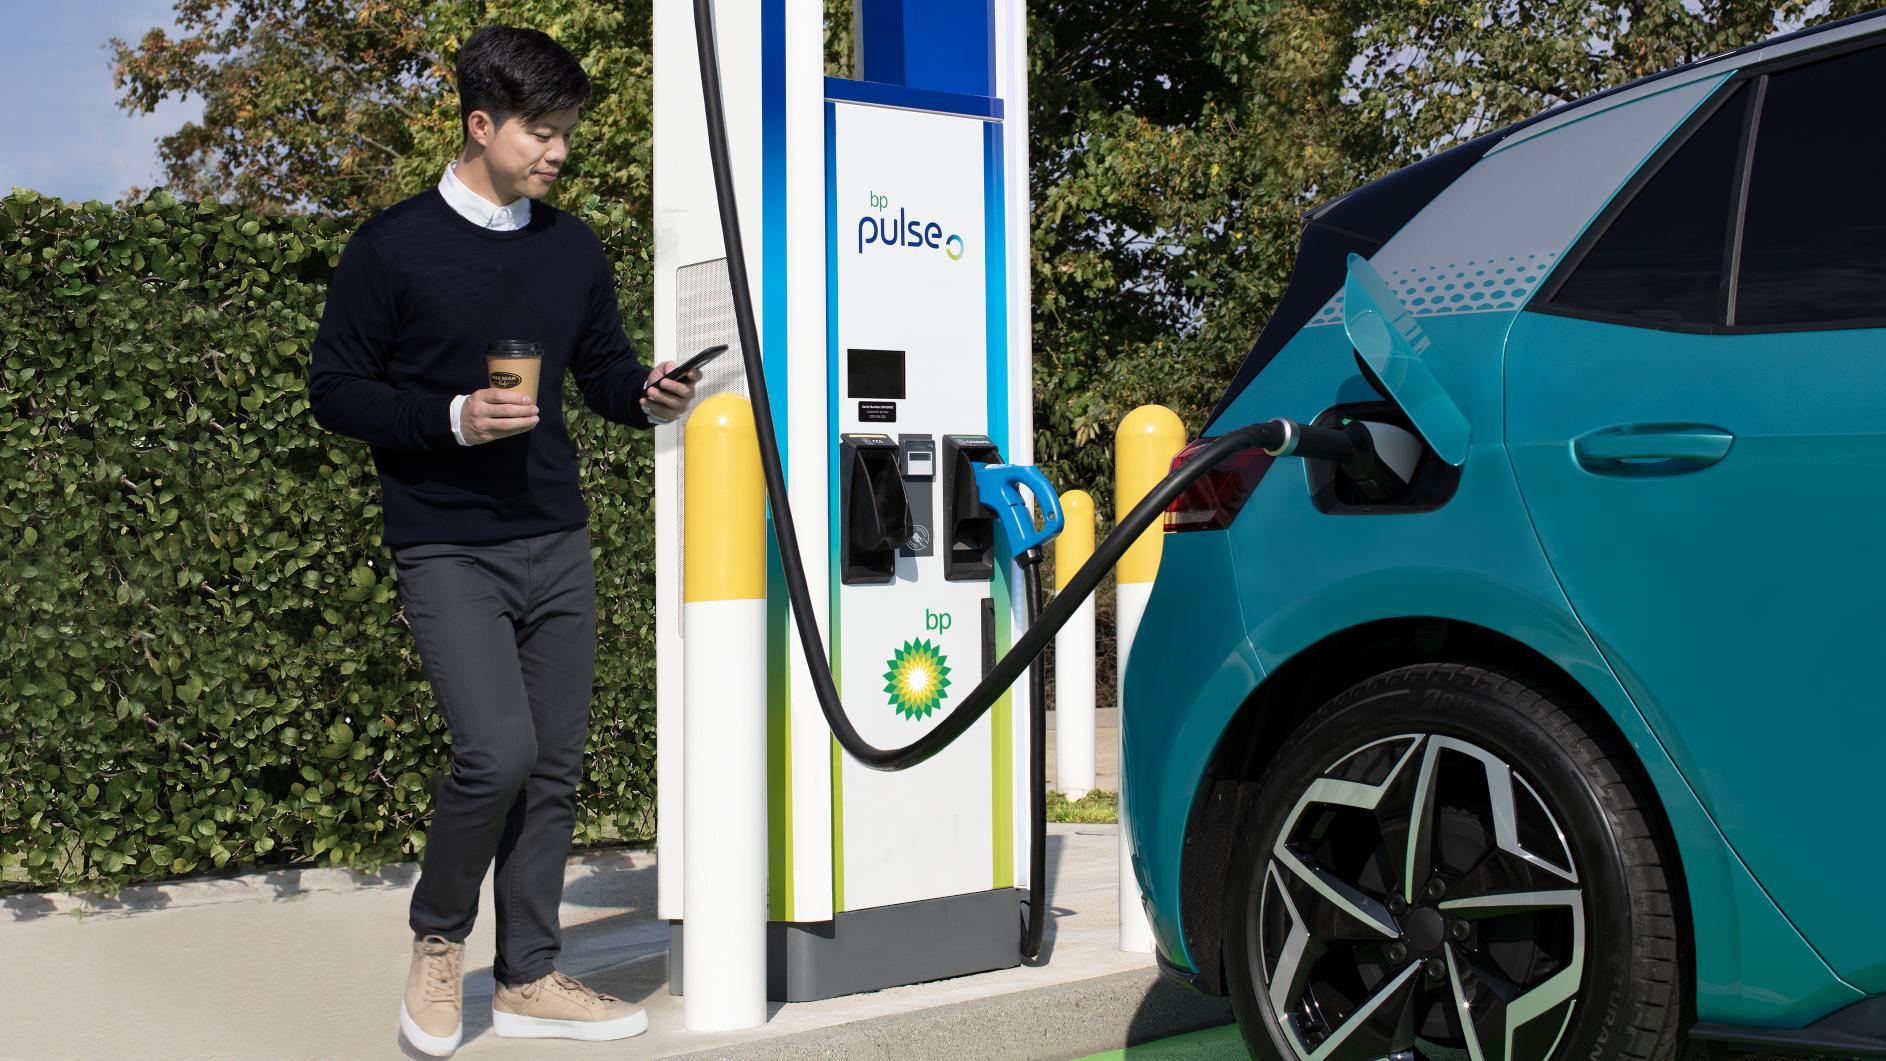 BP charging station